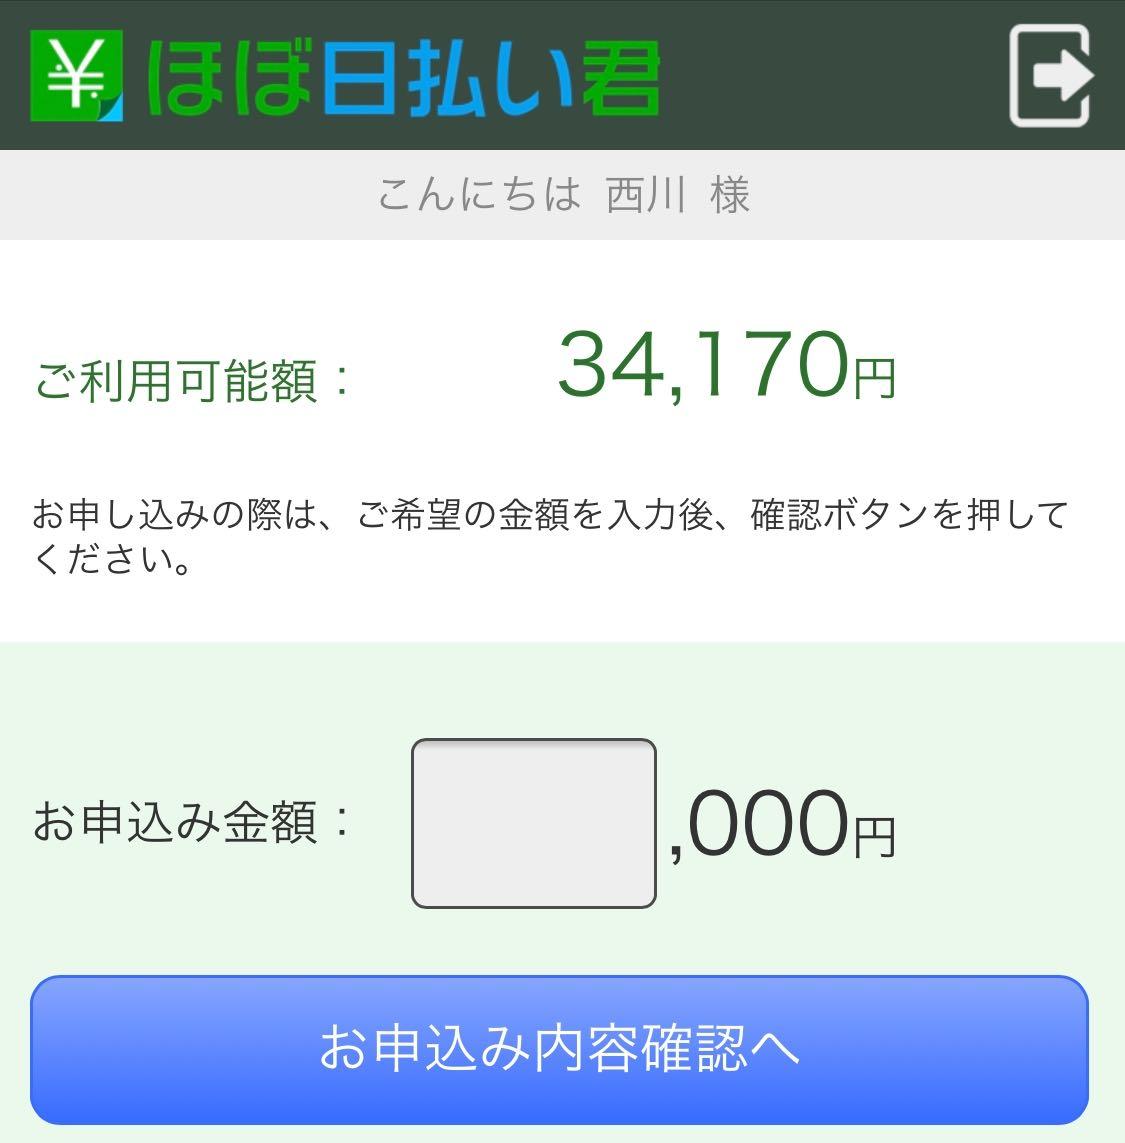 Image from iOS (1).jpg